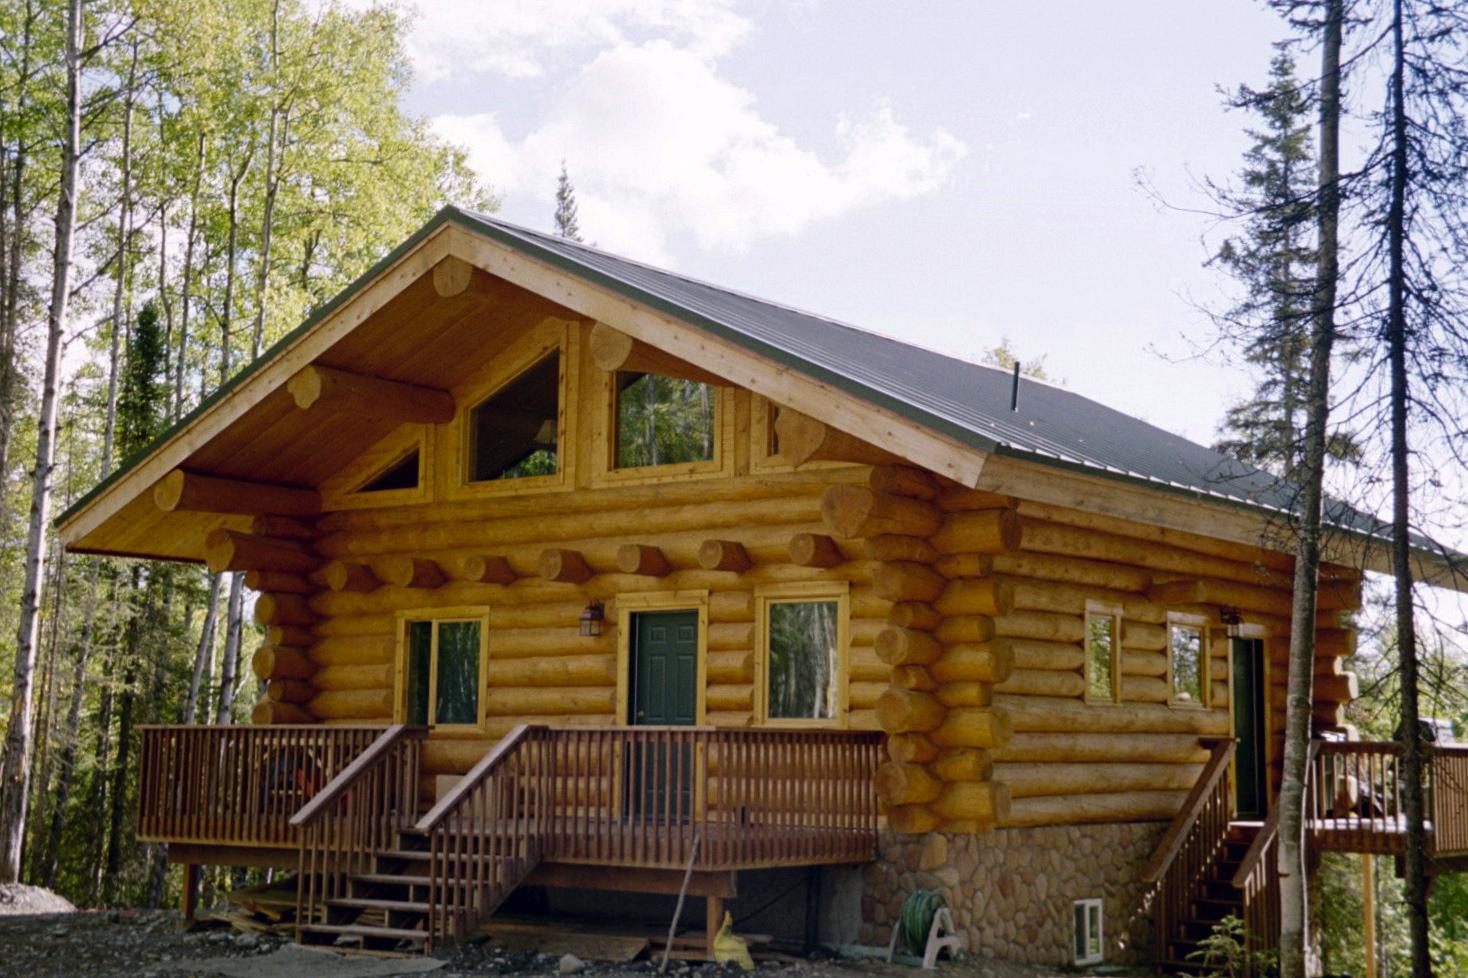 alaska haus kaufen alaska log home alaska blockhaus blockh user haus pinterest alaska. Black Bedroom Furniture Sets. Home Design Ideas